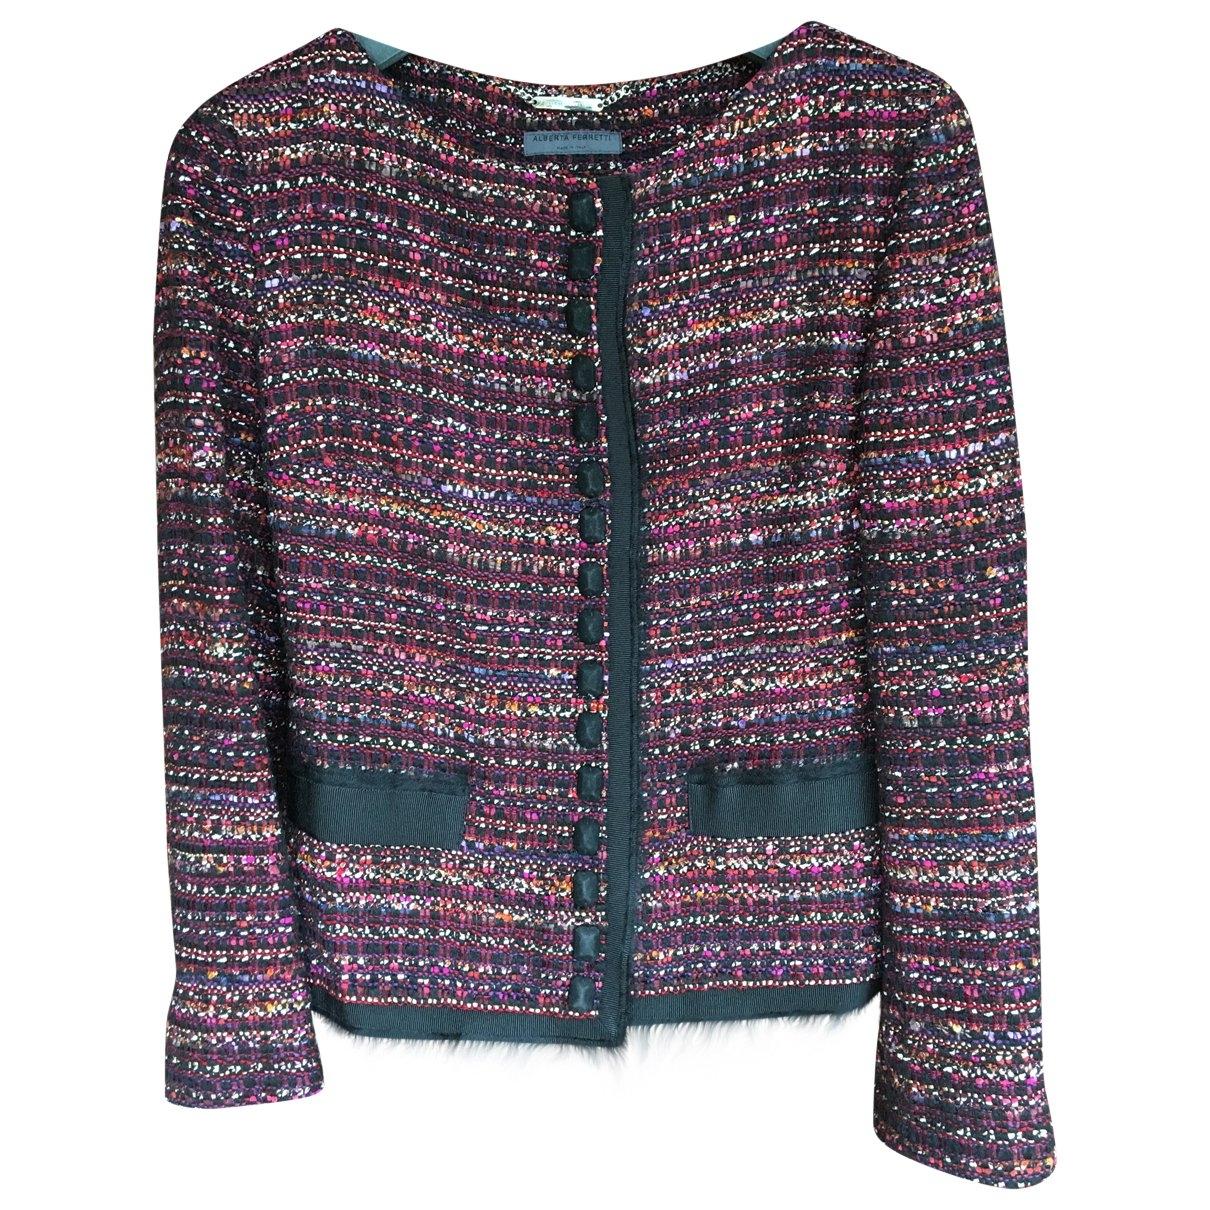 Alberta Ferretti \N Burgundy Tweed jacket for Women 40 IT